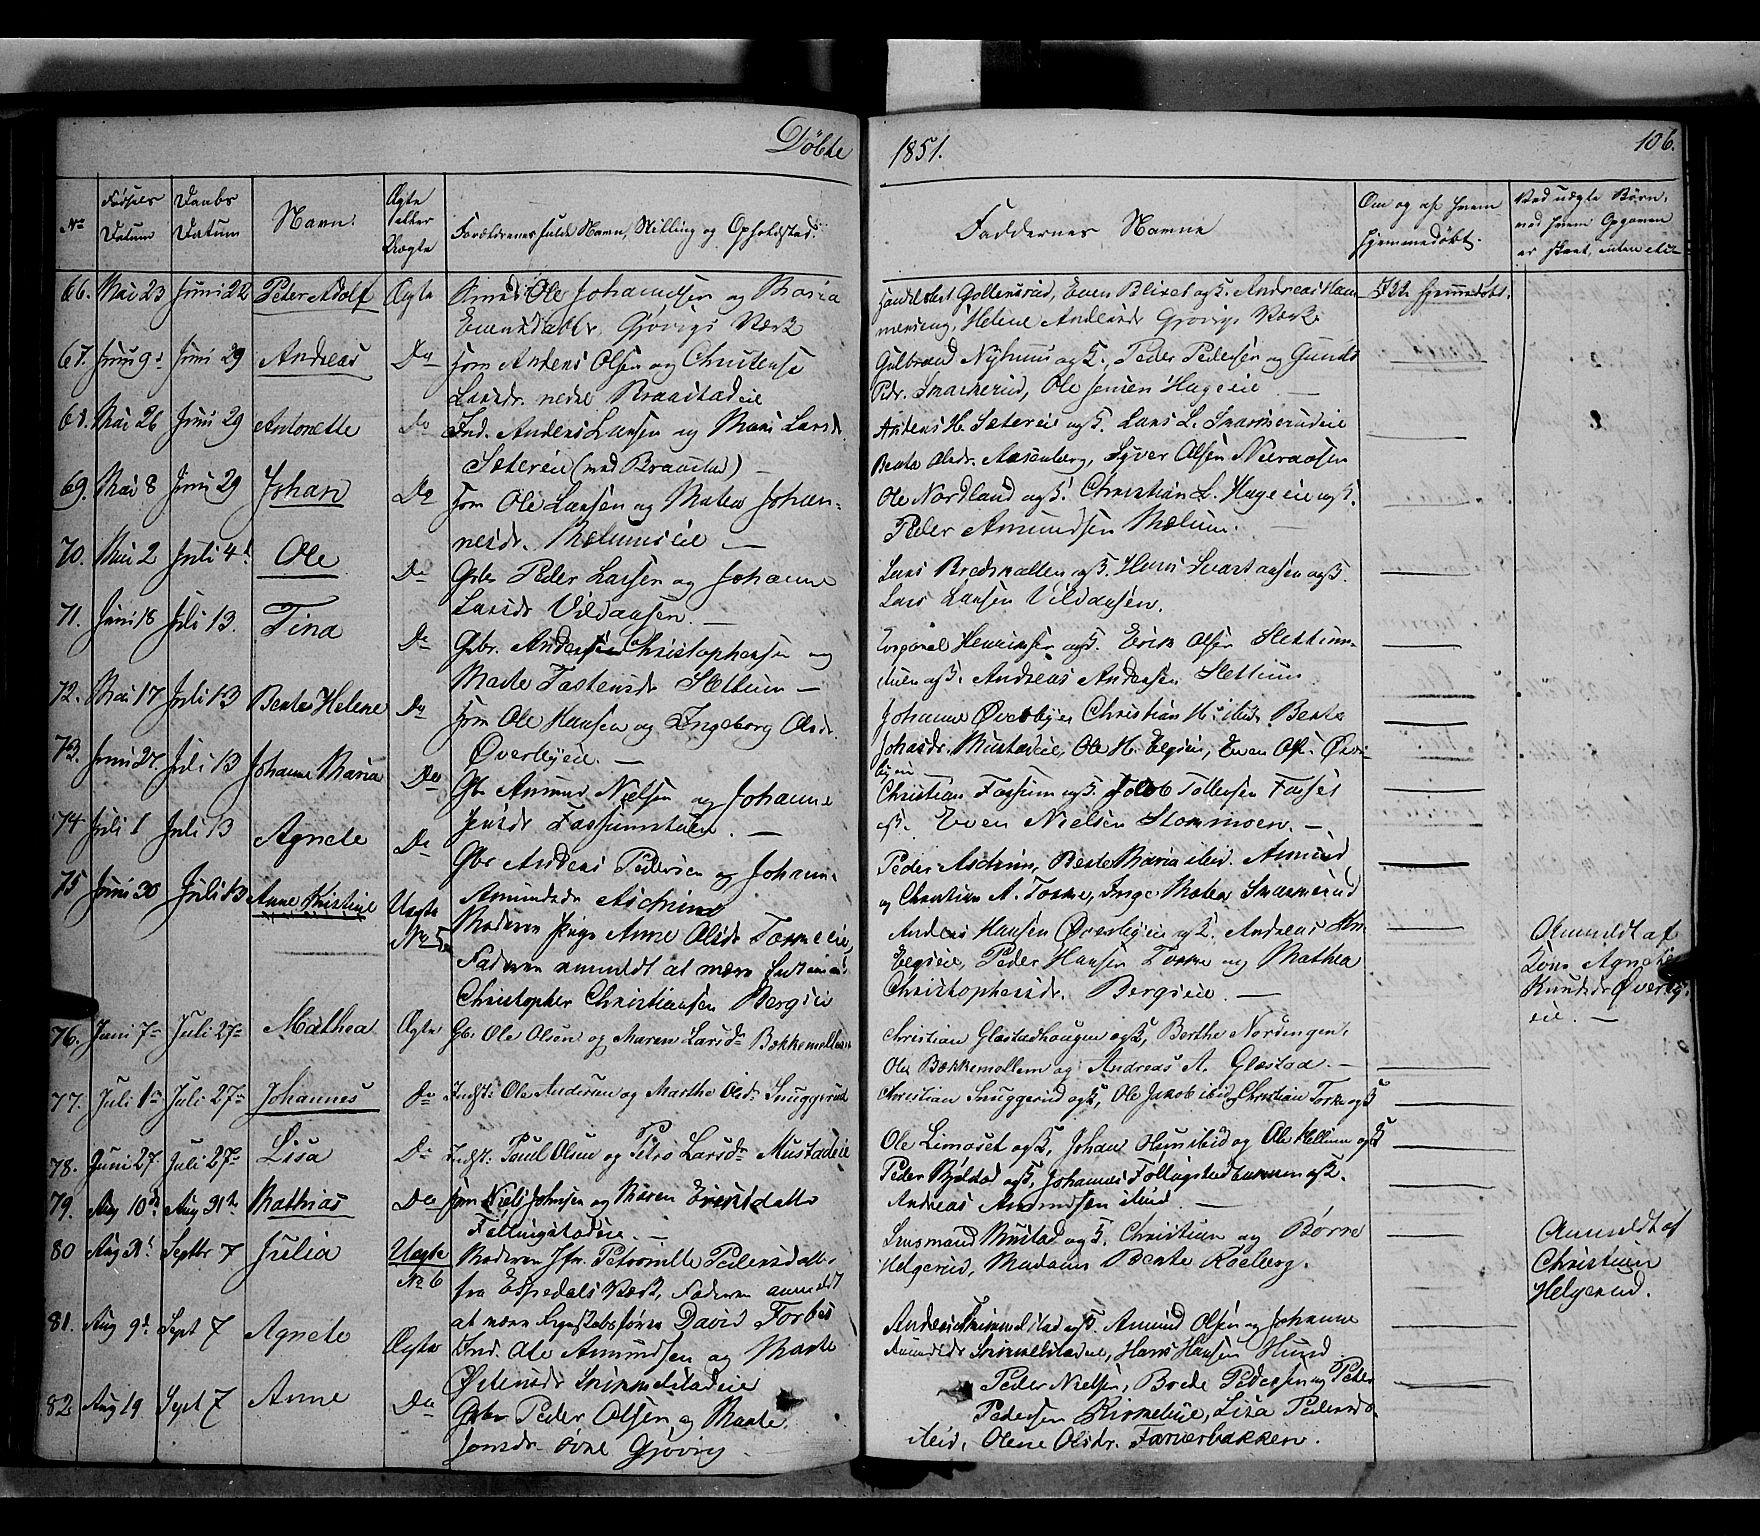 SAH, Vardal prestekontor, H/Ha/Haa/L0005: Ministerialbok nr. 5, 1831-1853, s. 106